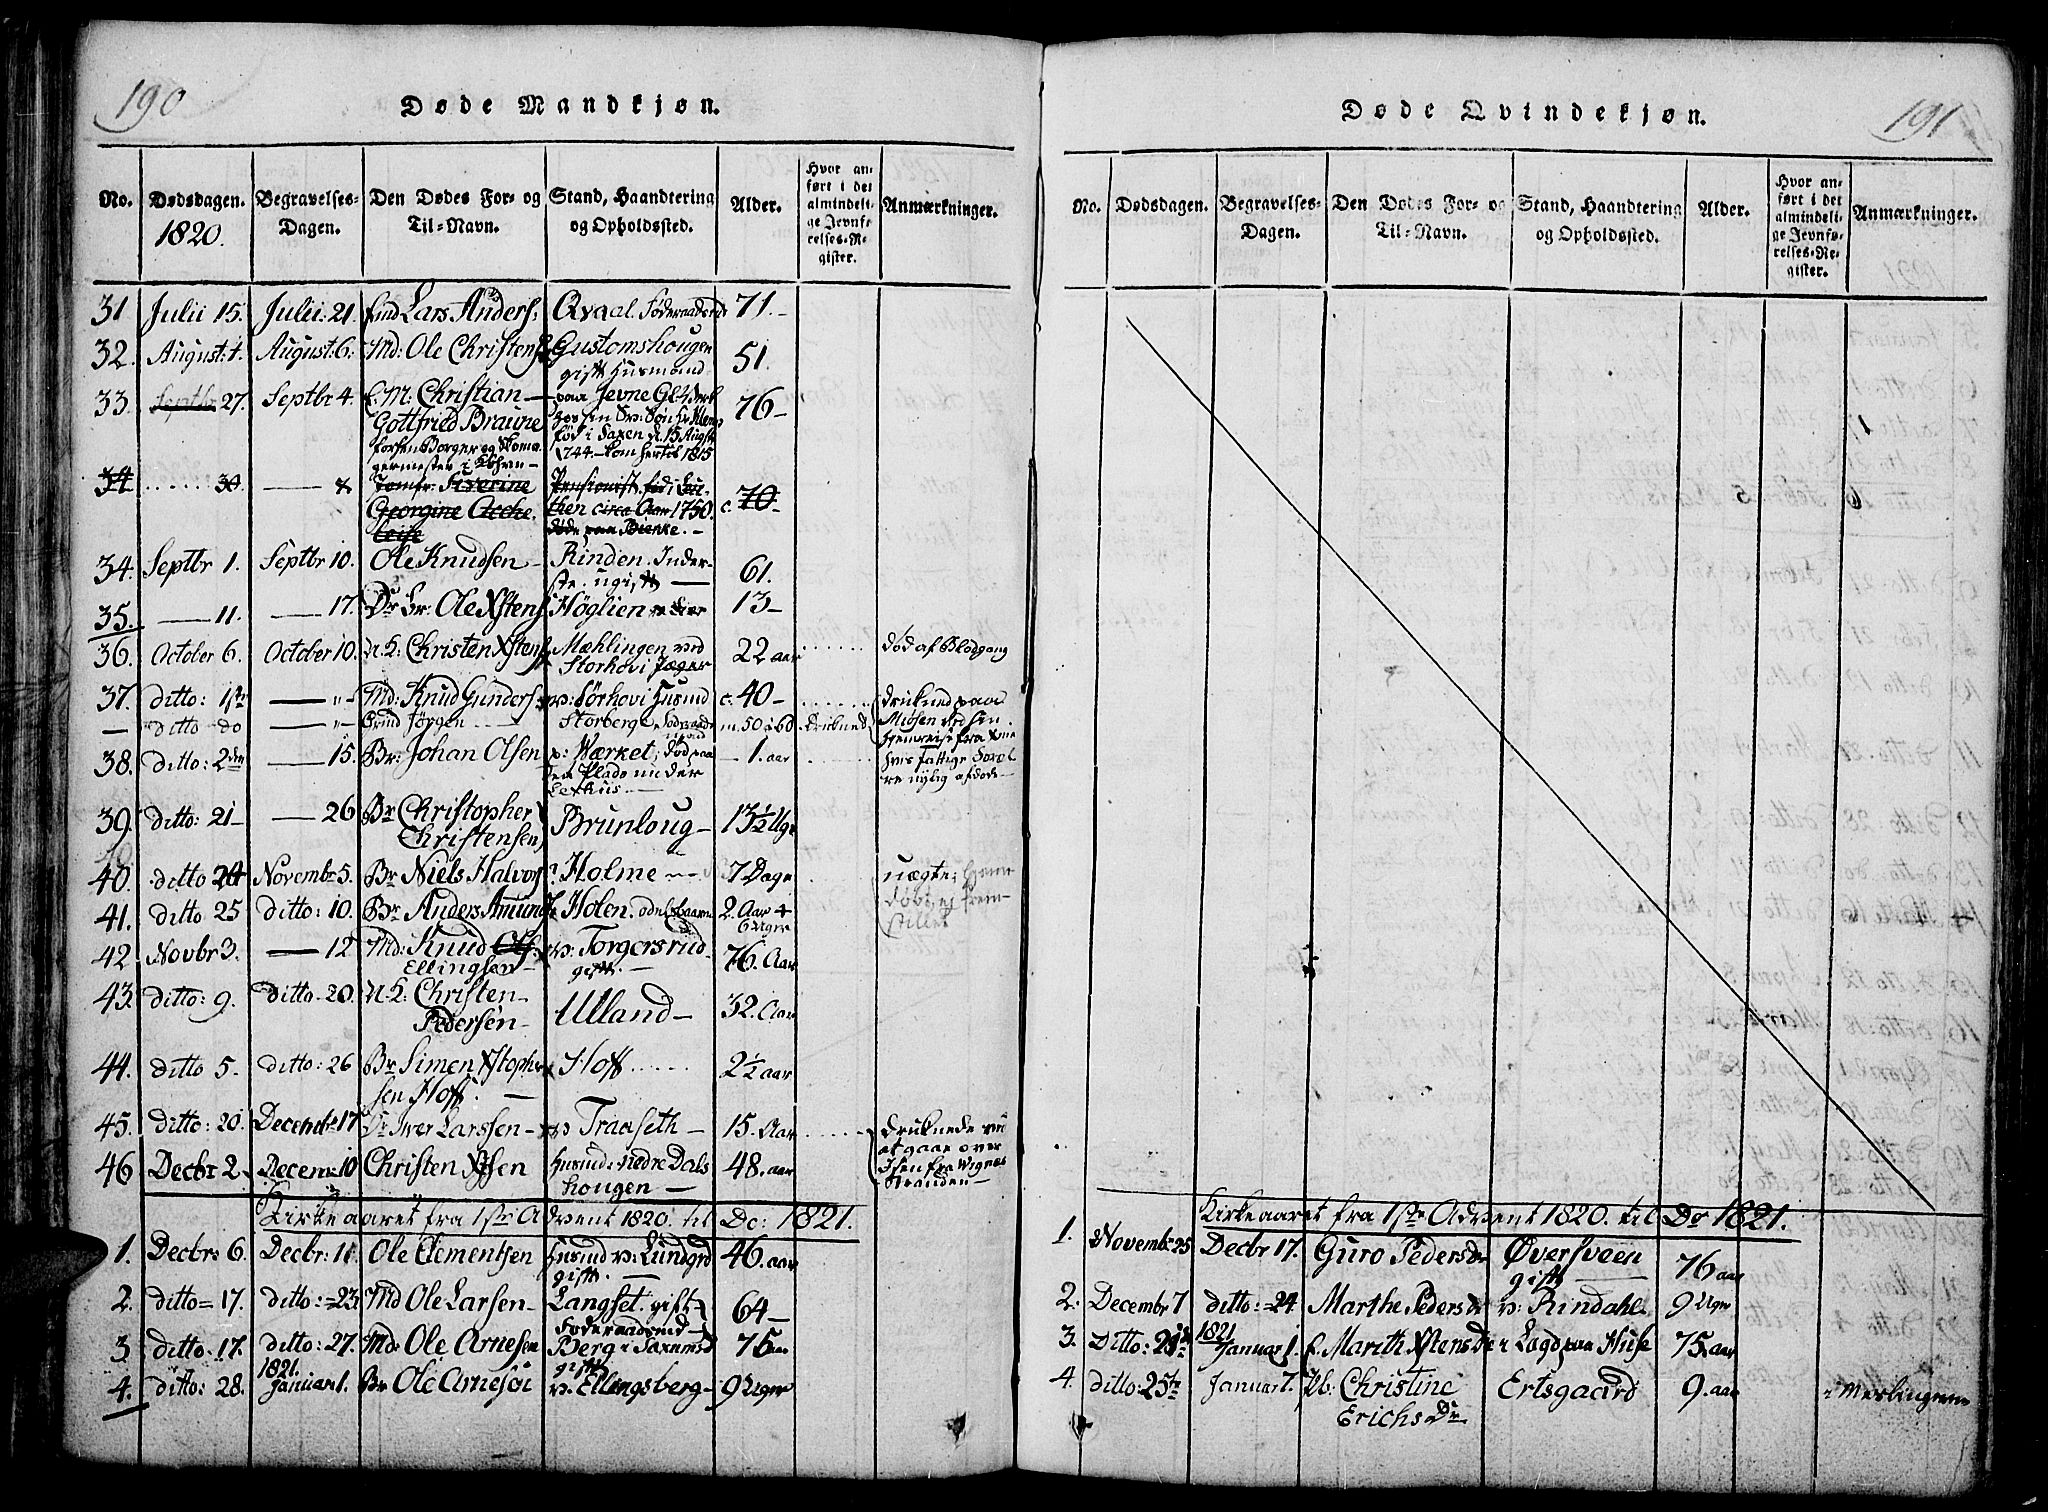 SAH, Fåberg prestekontor, Ministerialbok nr. 3, 1818-1833, s. 190-191